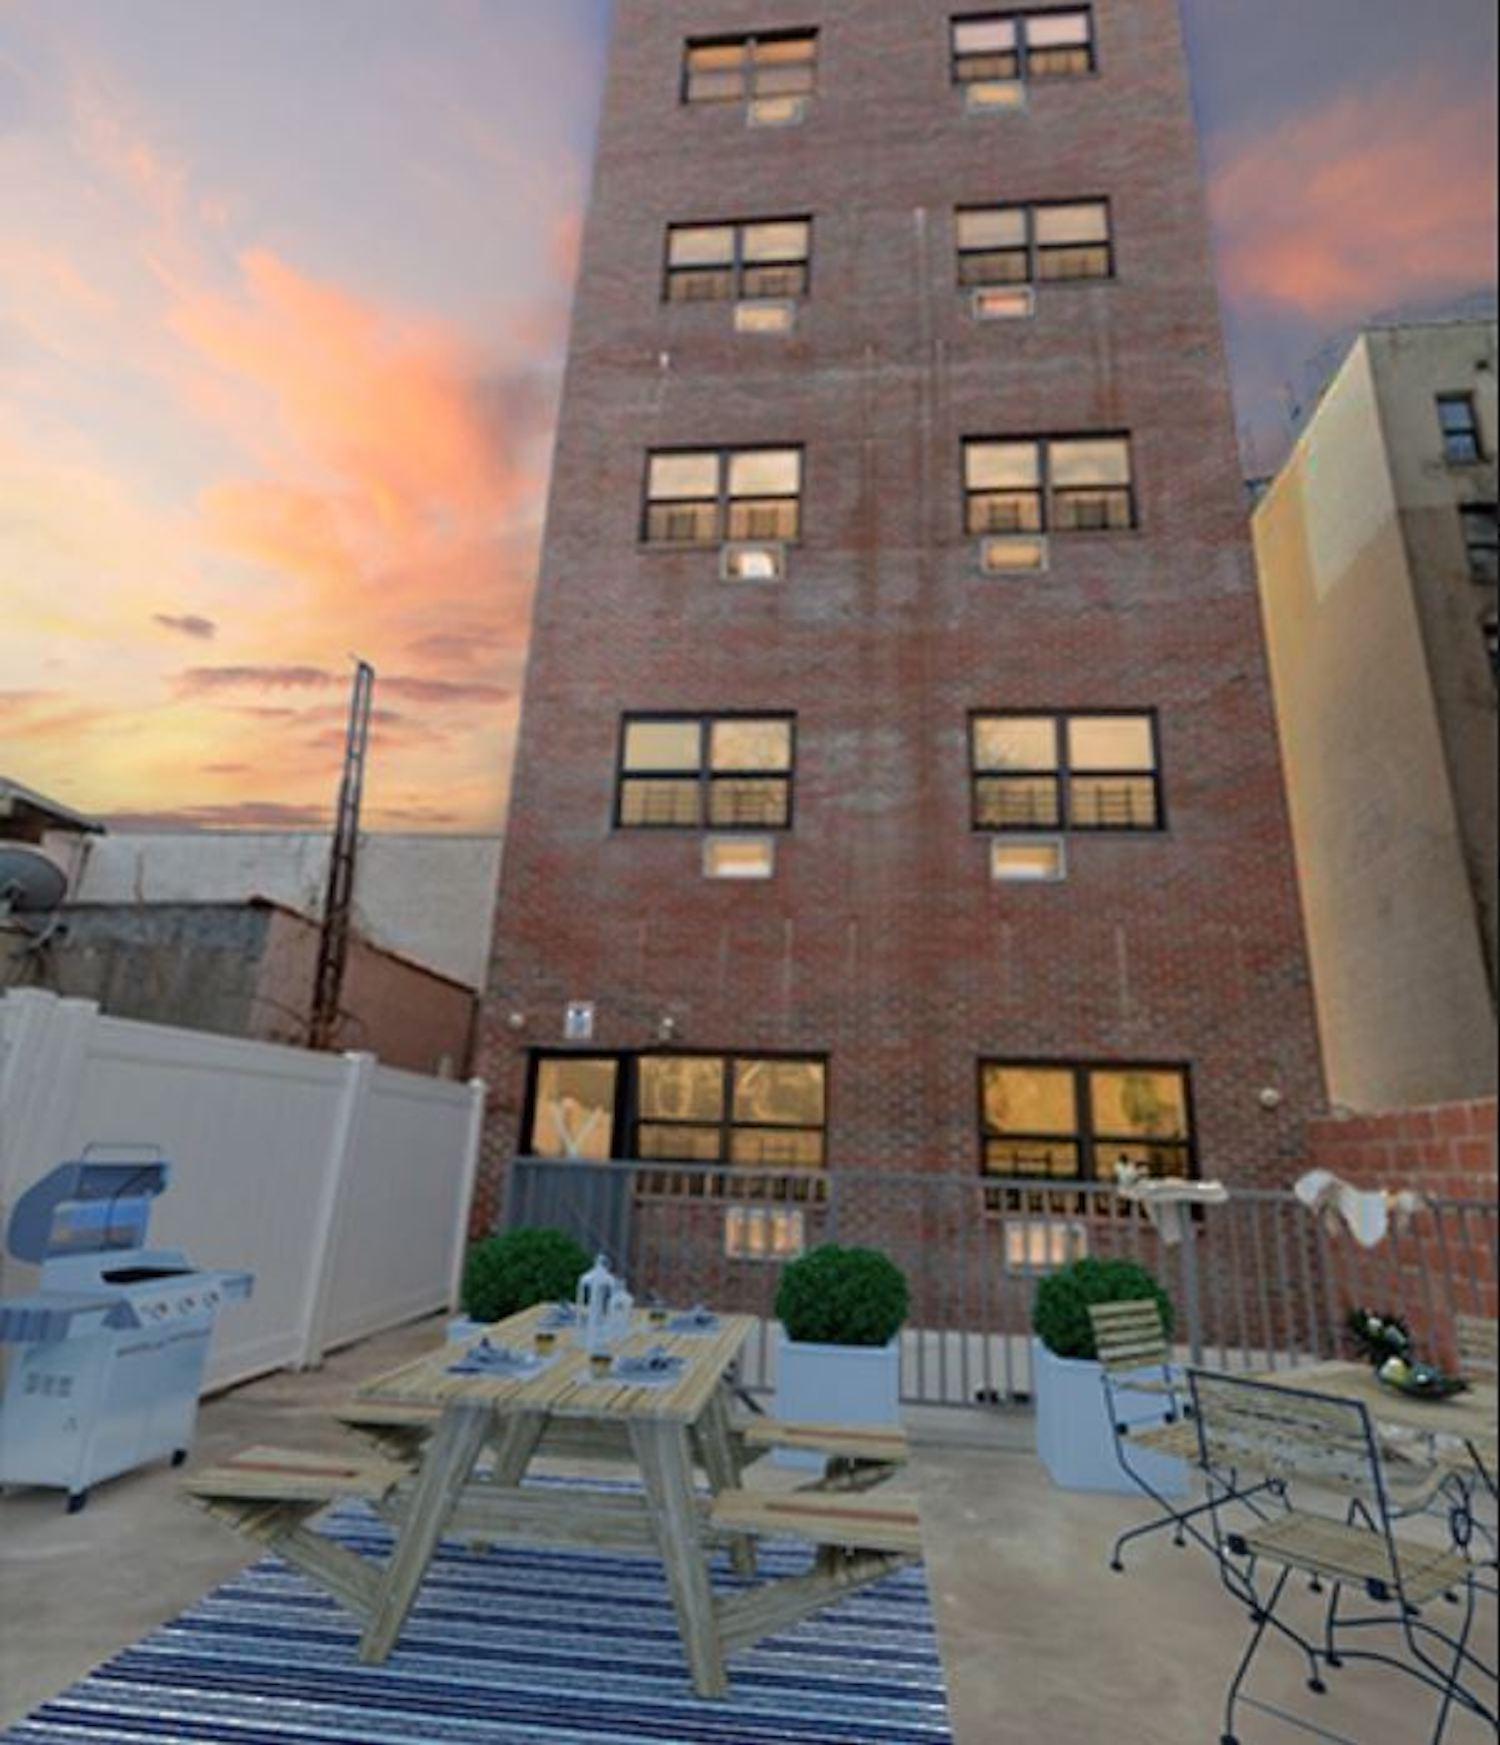 103-43 120th Street in South Richmond Hill, Queens